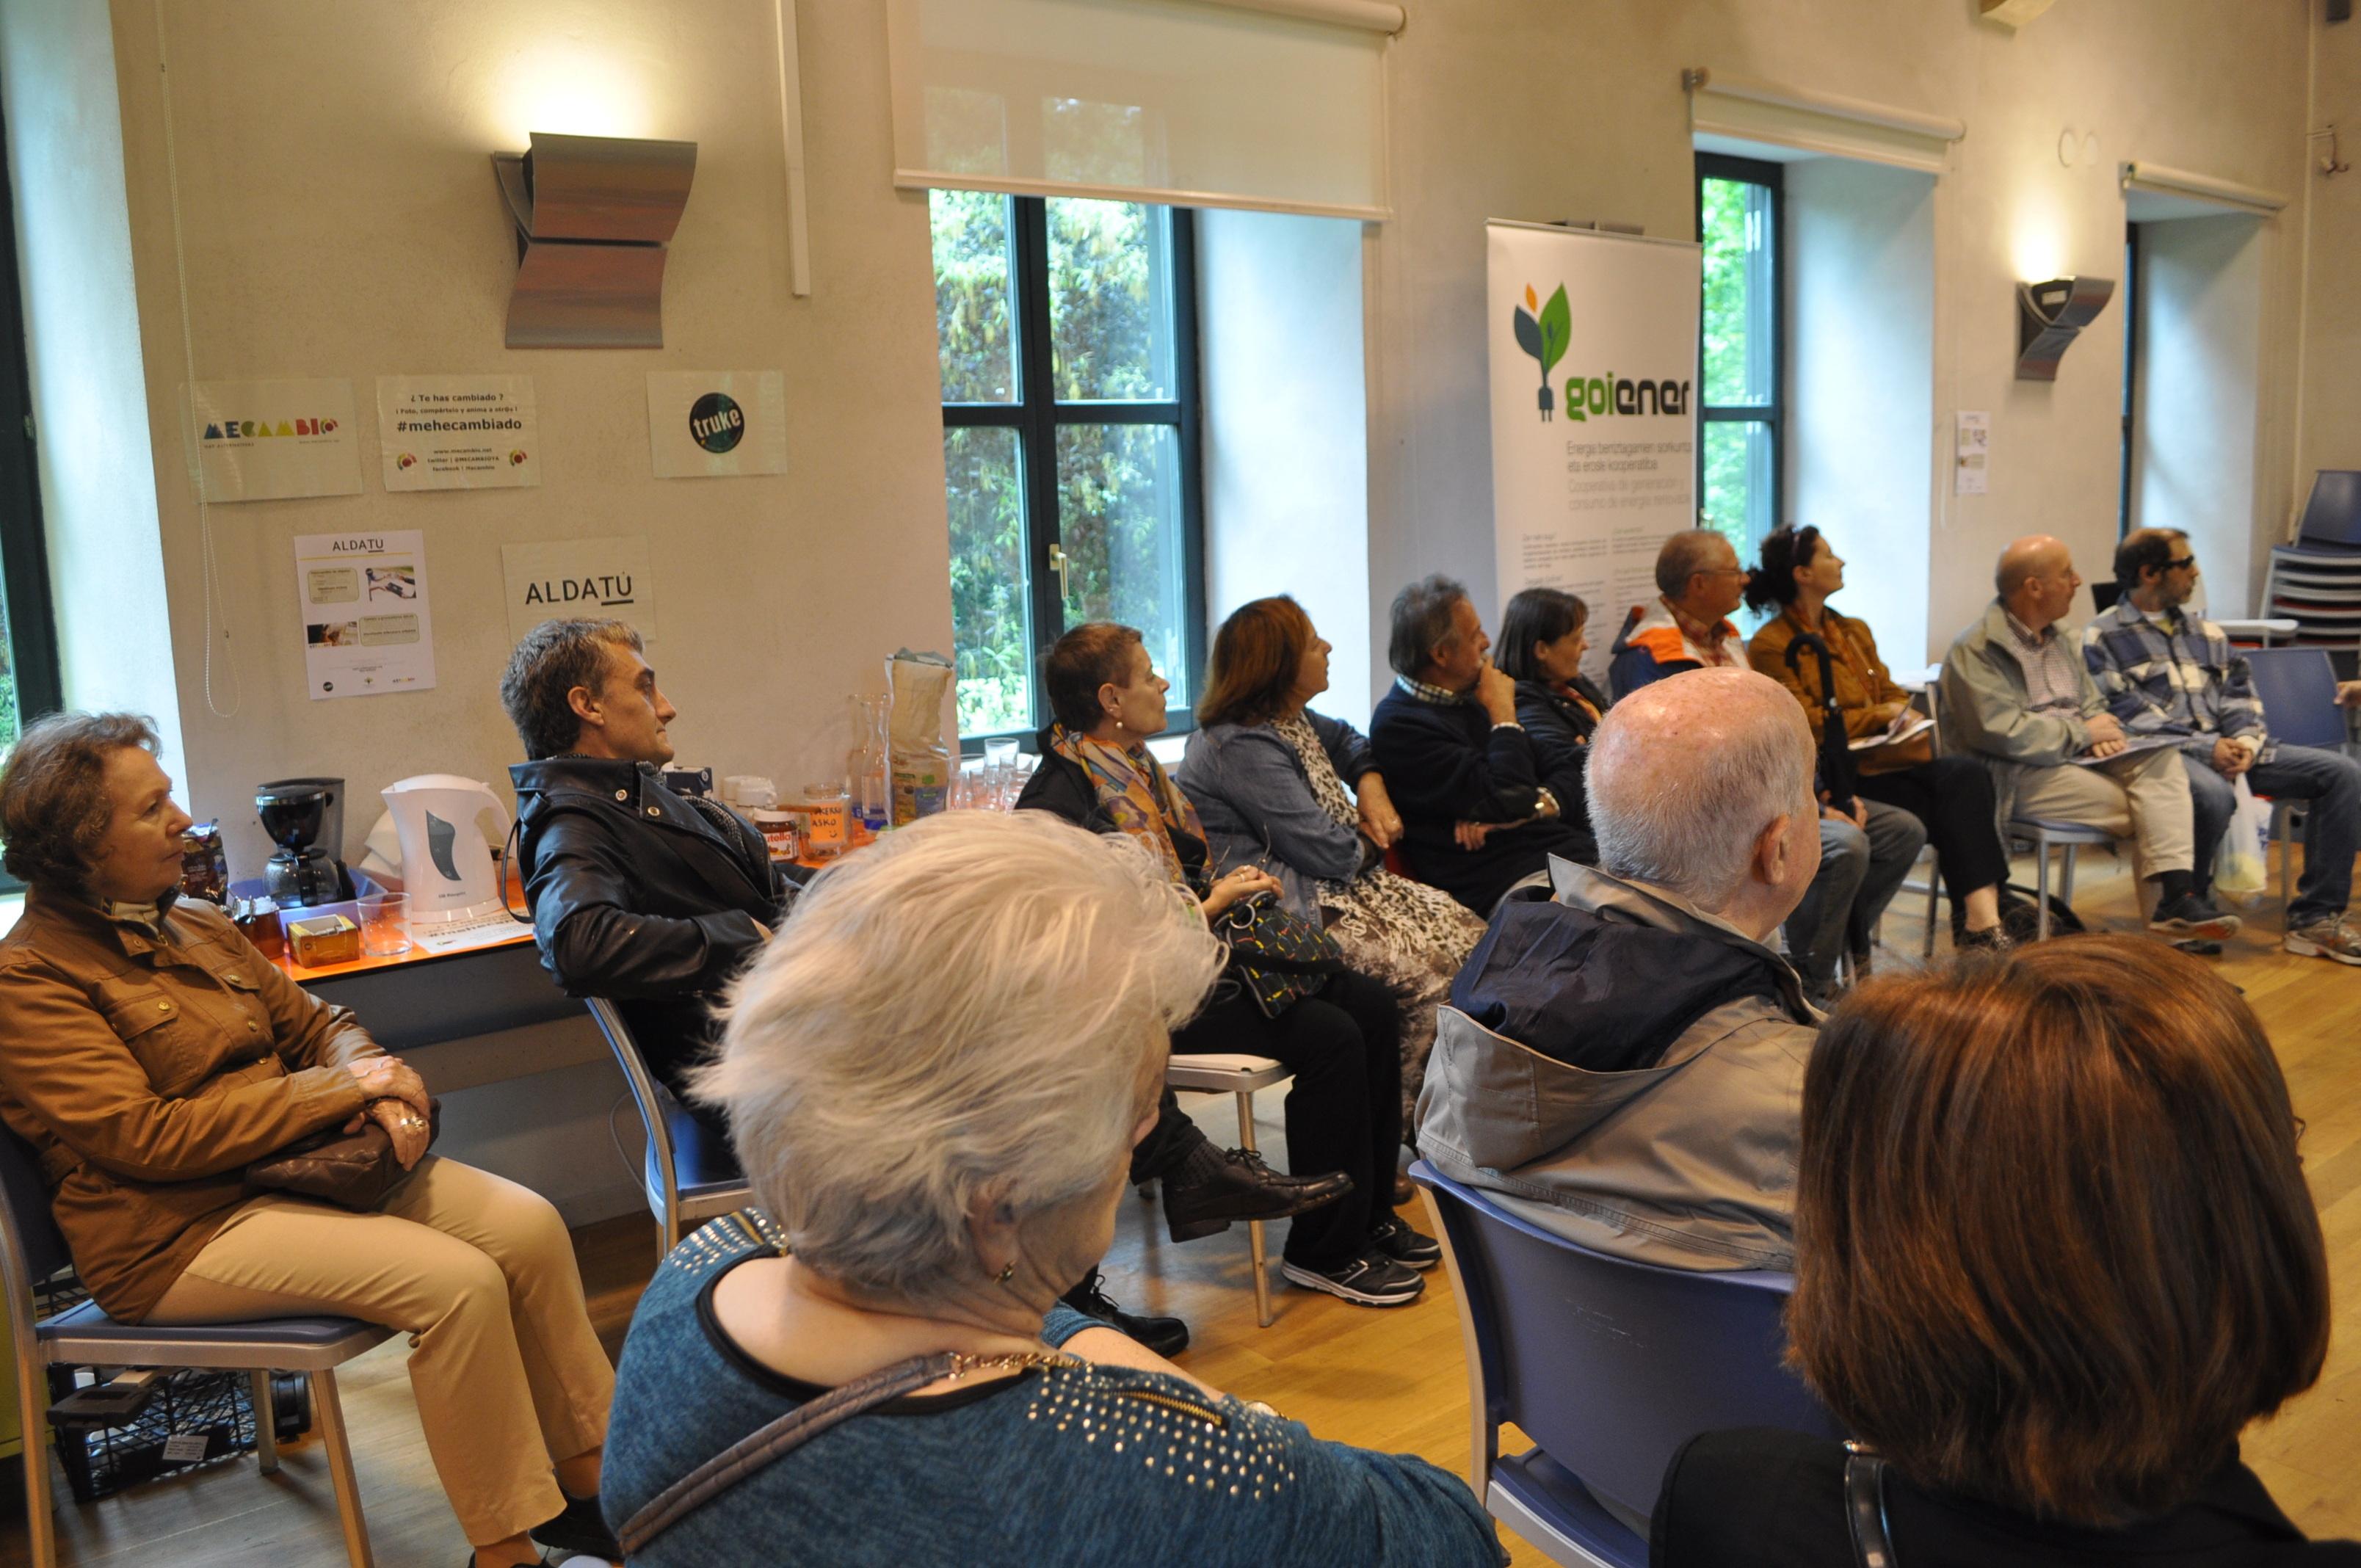 Un grupo de personas escucha atentamente.